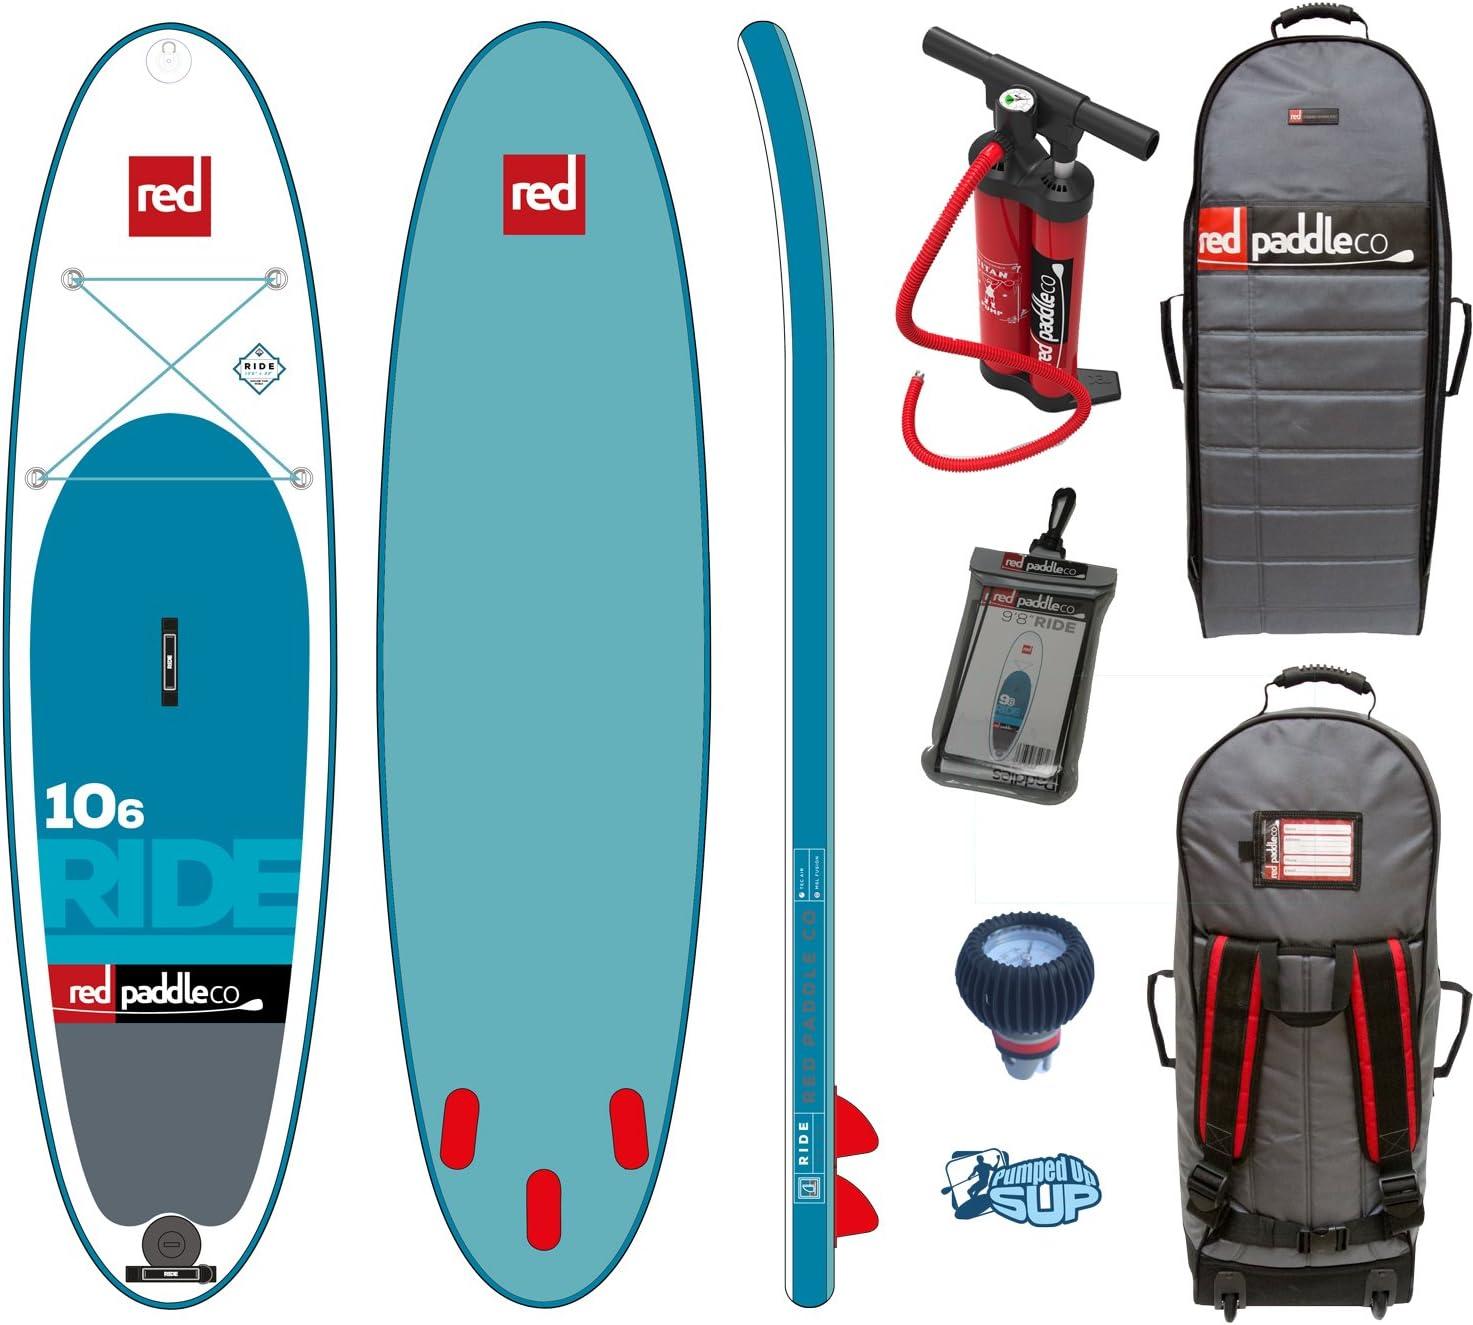 Includes Bundle Backpack Red Paddle Co Ride MSL 106 x 32 SE ERS Pressure Gauge Pumped Up SUP Sticker 2019 Series Titan Pump